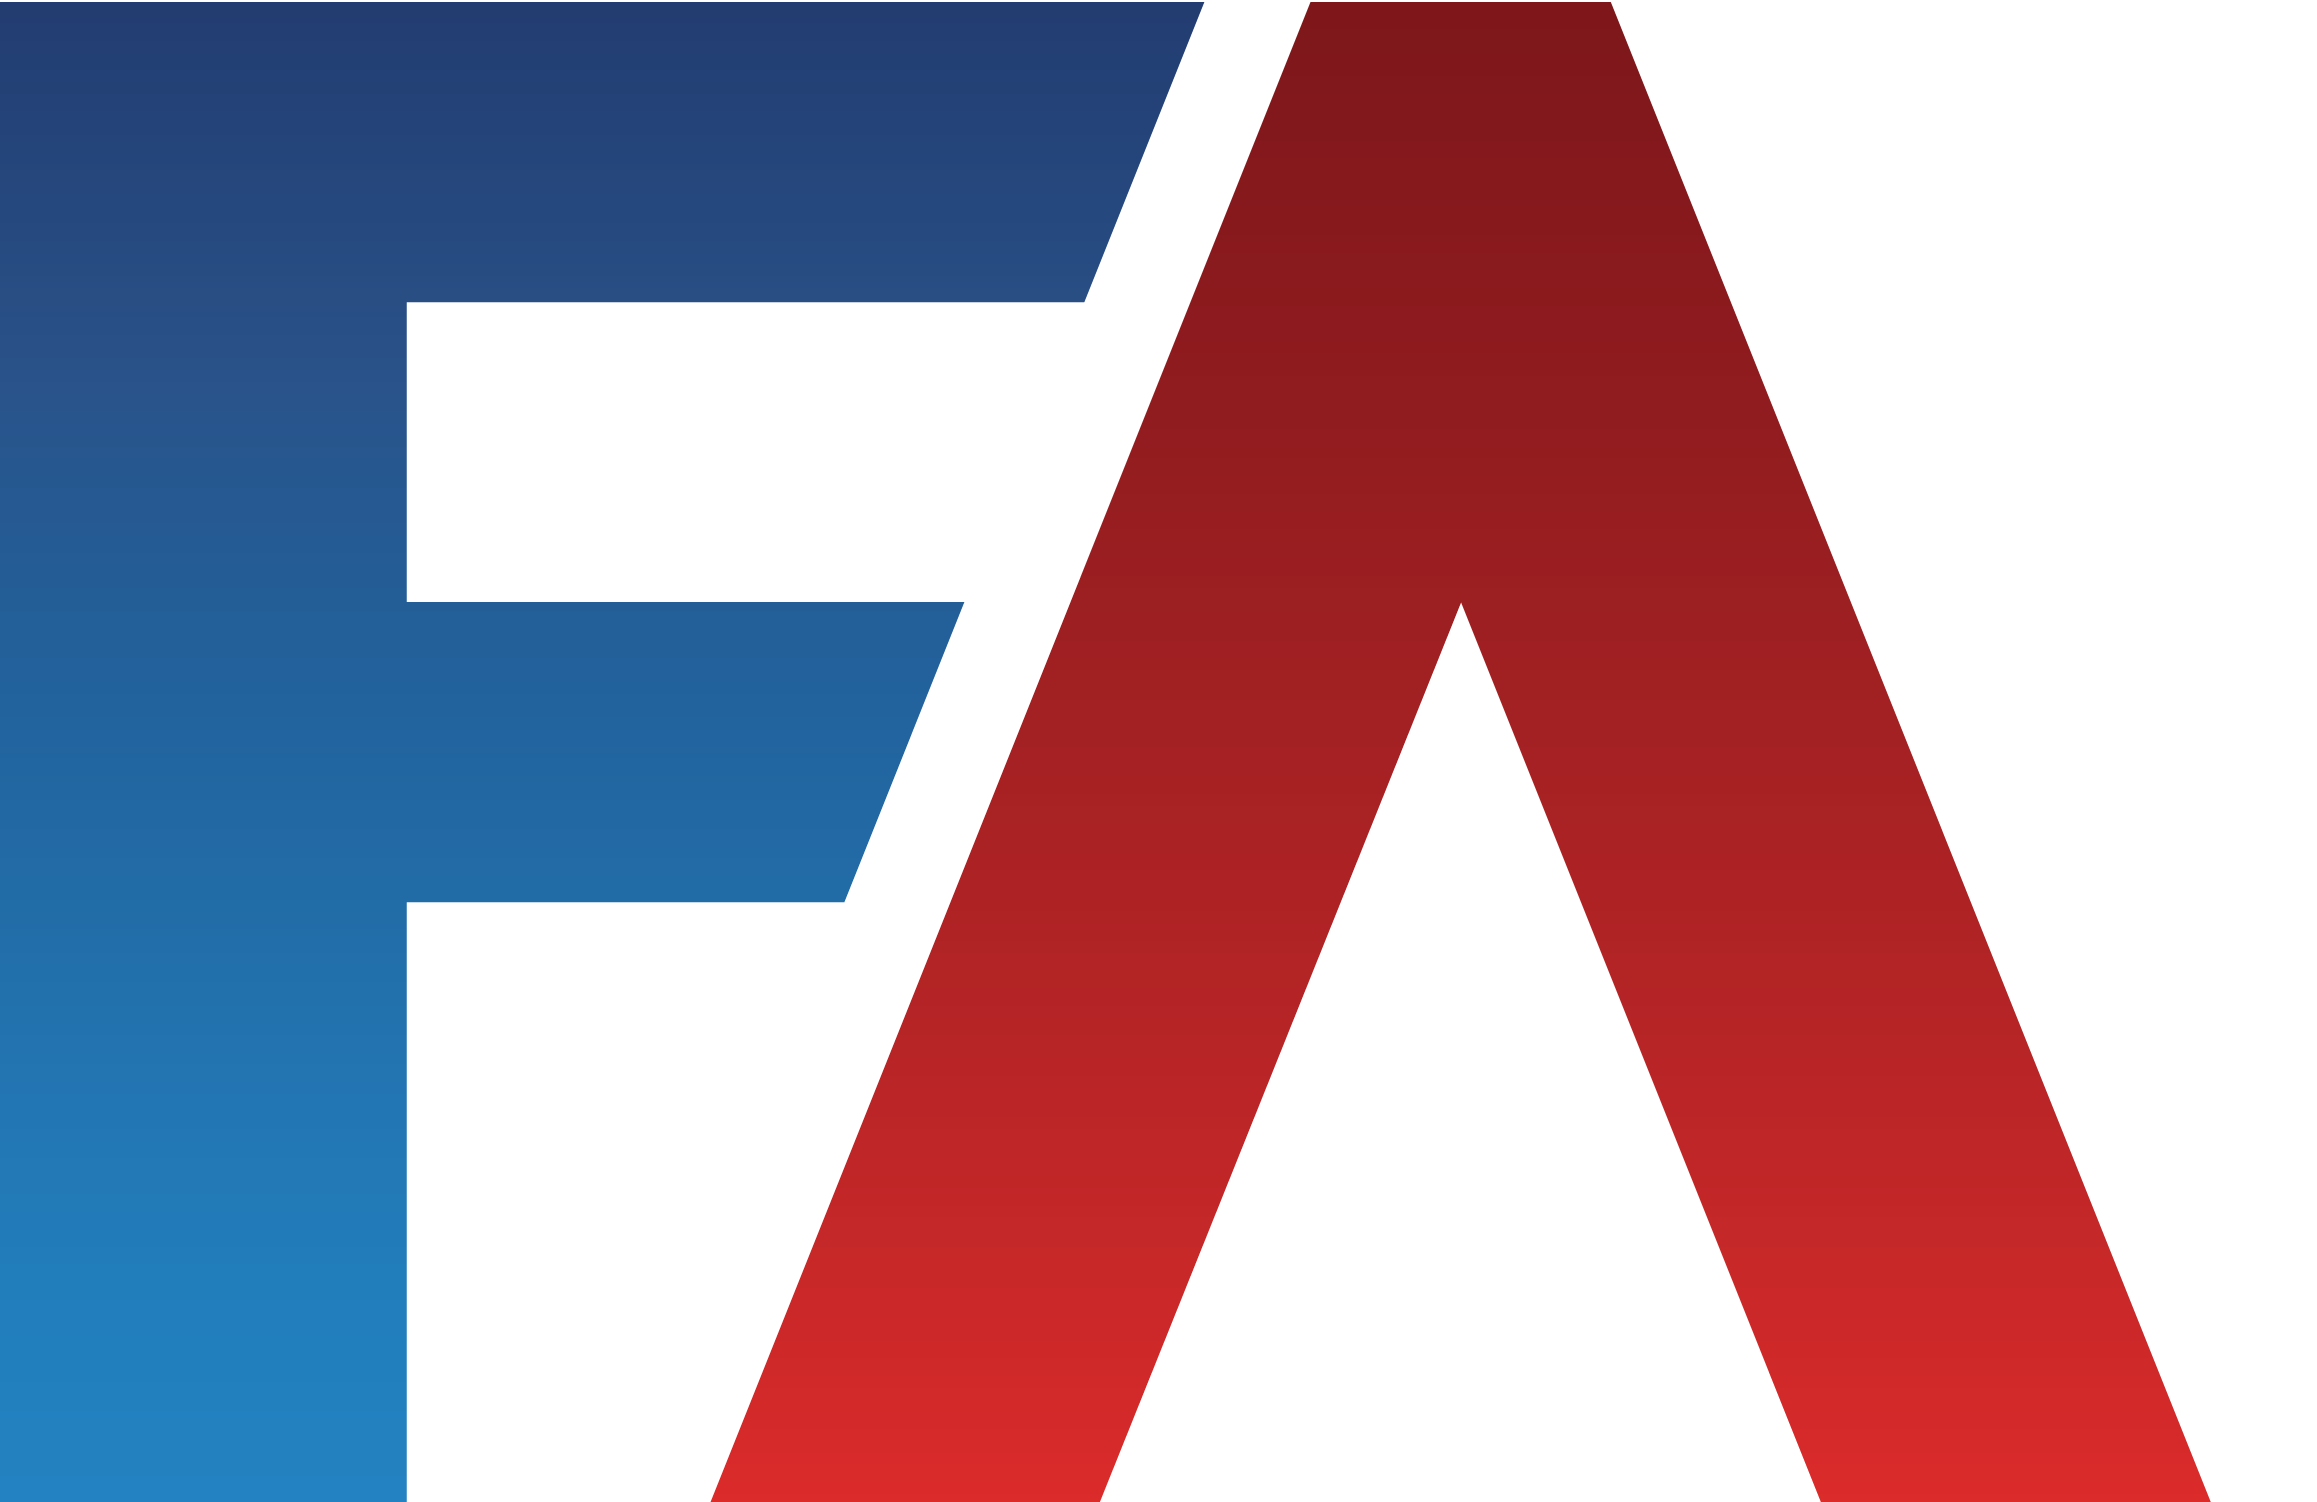 Anthony Davis - PF | FantasyAlarm.com